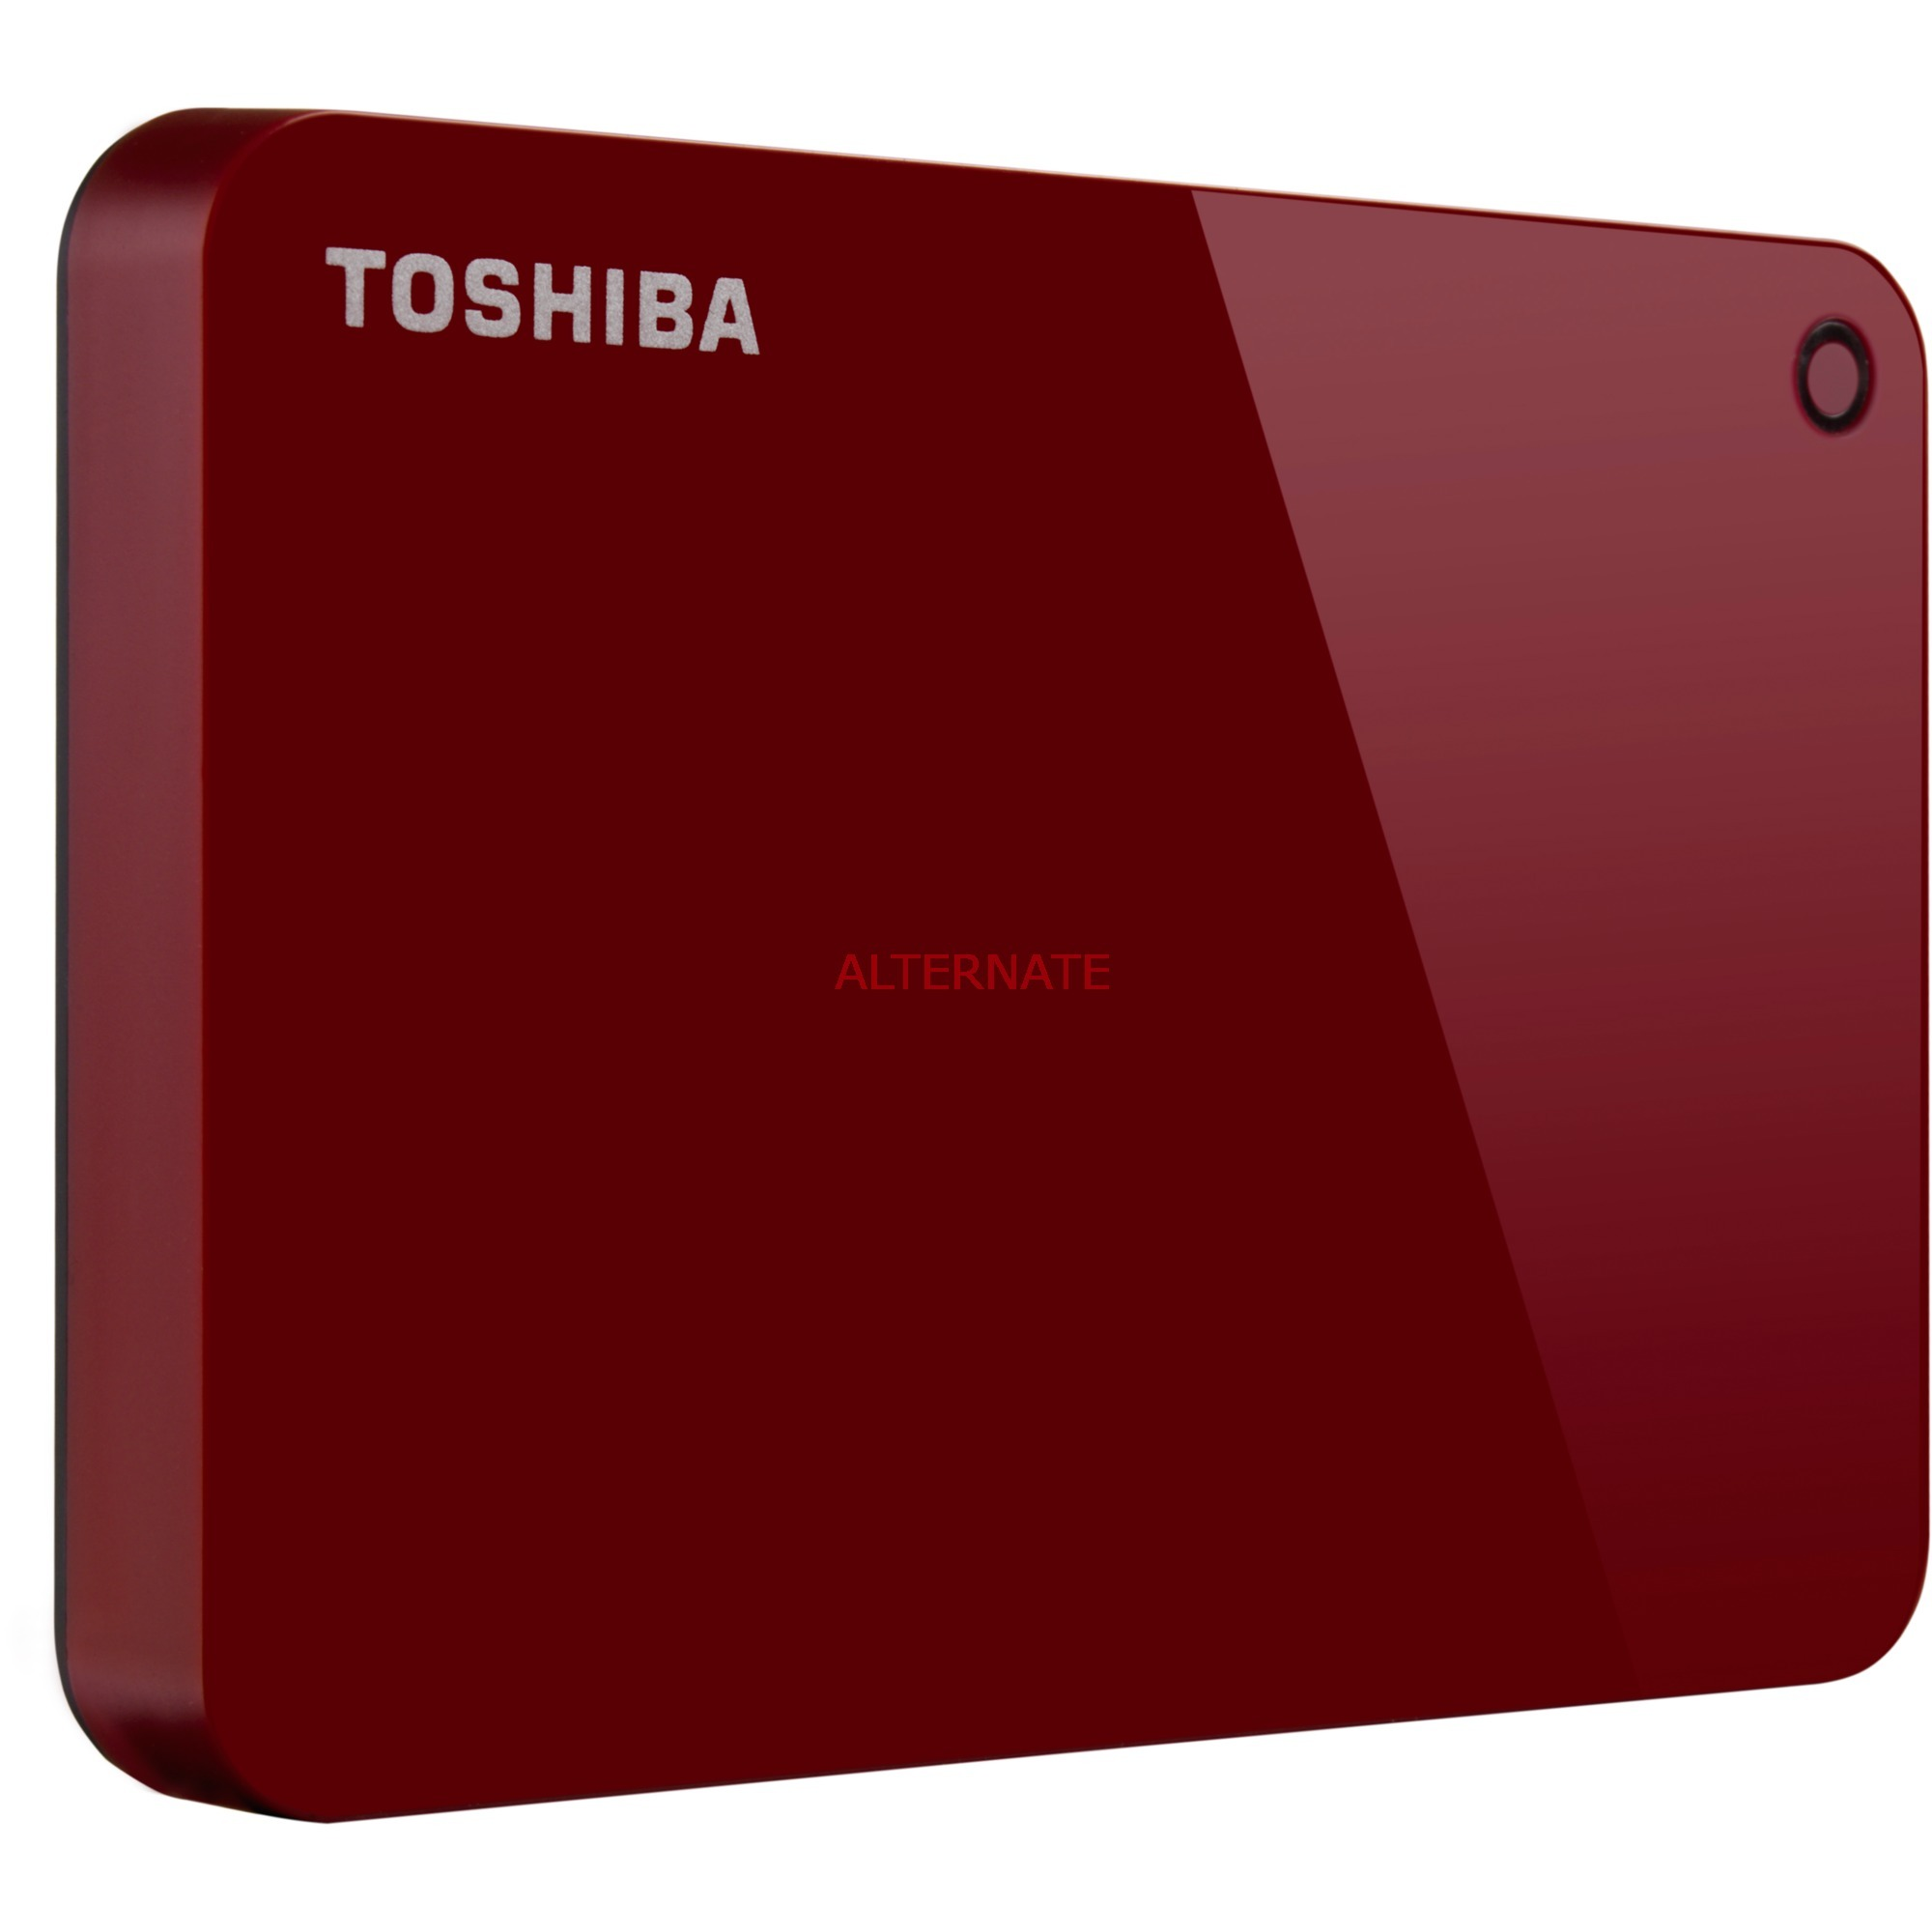 Canvio Advance disco duro externo 1000 GB Rojo, Unidad de disco duro